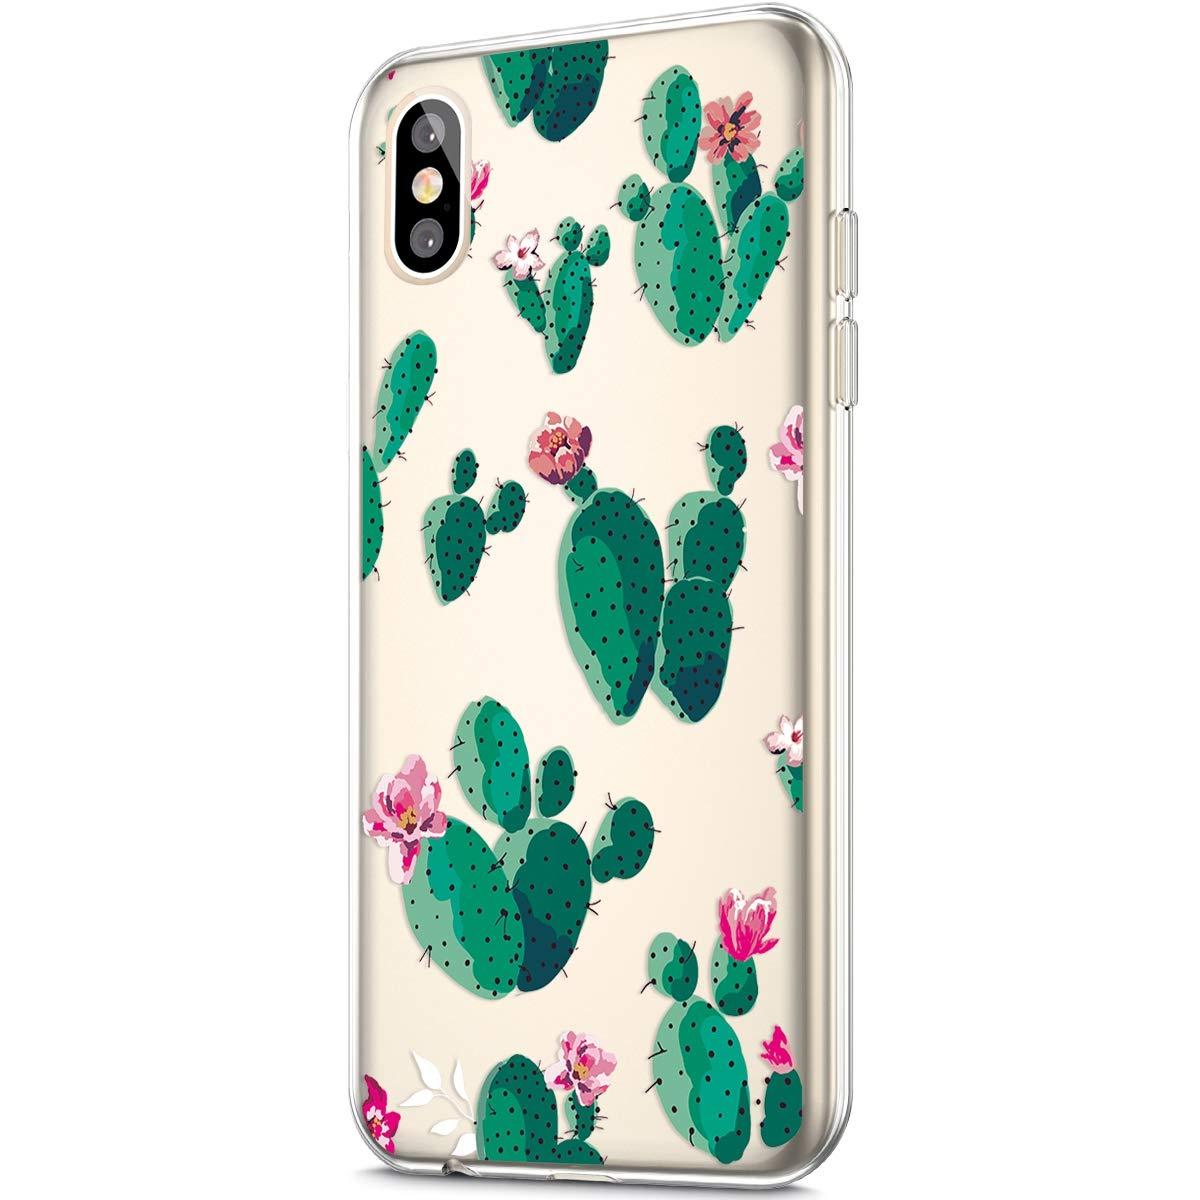 Jinghuash Kompatibel mit iPhone X//XS H/ülle Transparent TPU Silikon mit Muster Ultra D/ünn Durchsichtig TPU Sto/ßfest Bumper Handyh/ülle Schutzh/ülle Tasche Case-Farbe Herz